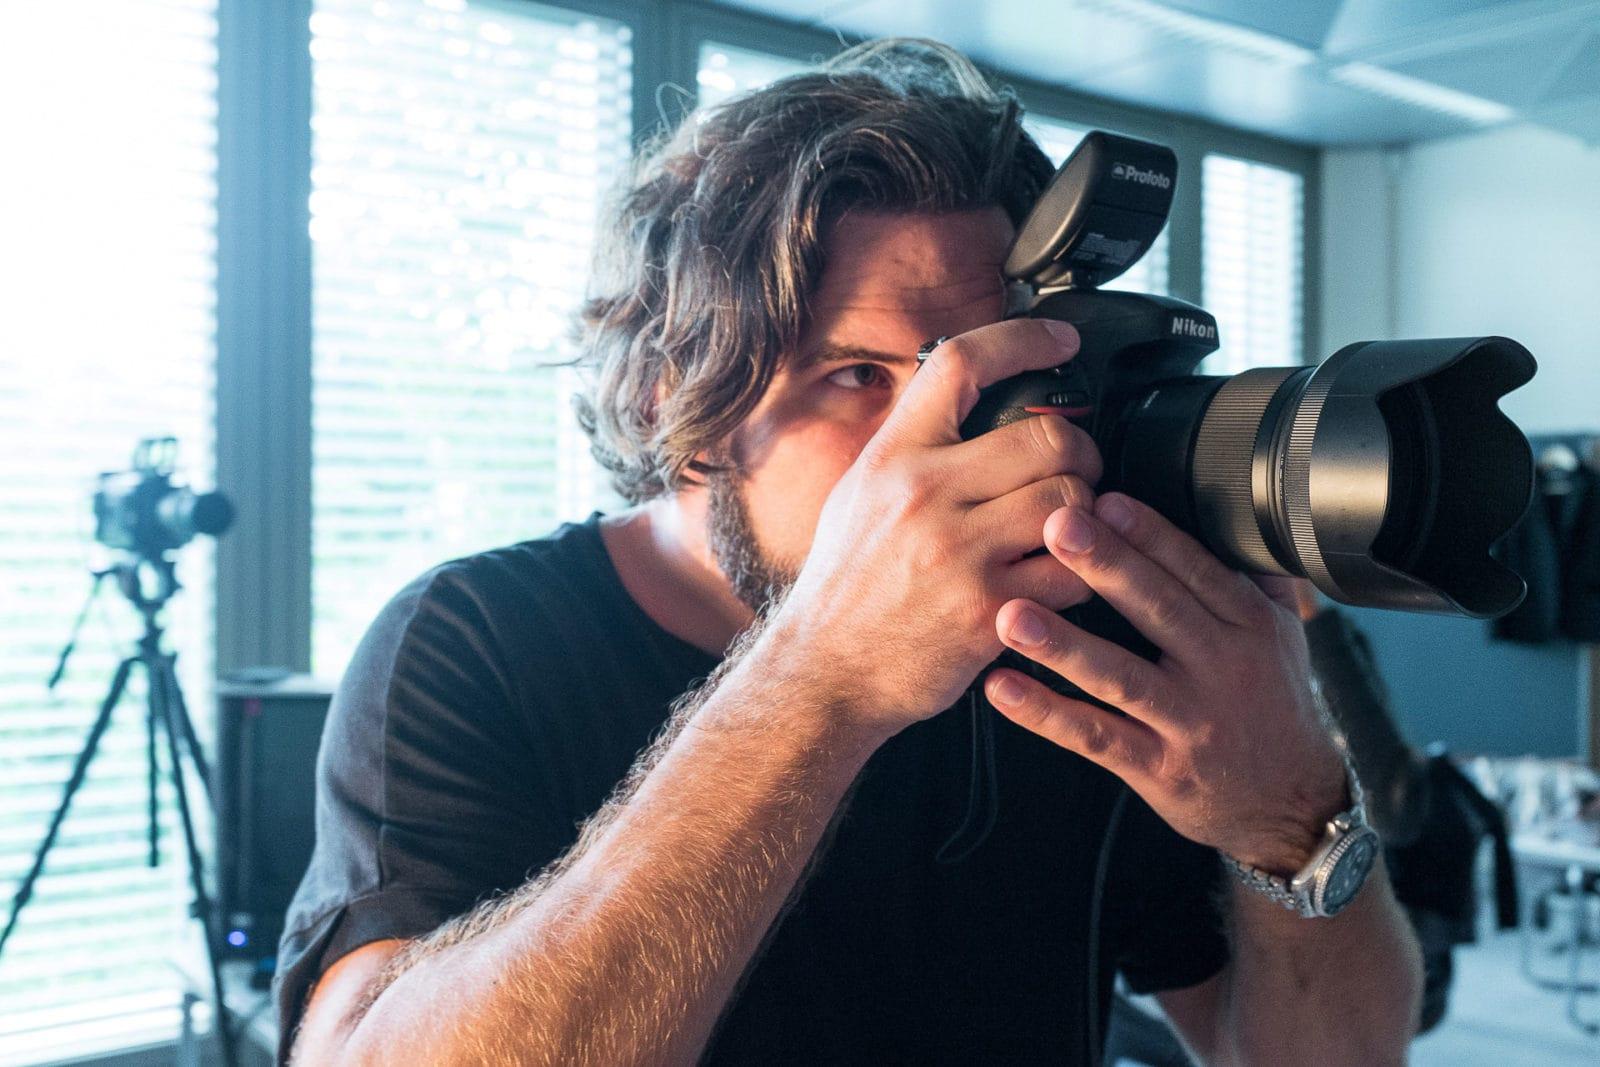 Markus Mielek Kamera Nikon Signal Iduna Werbekampagne